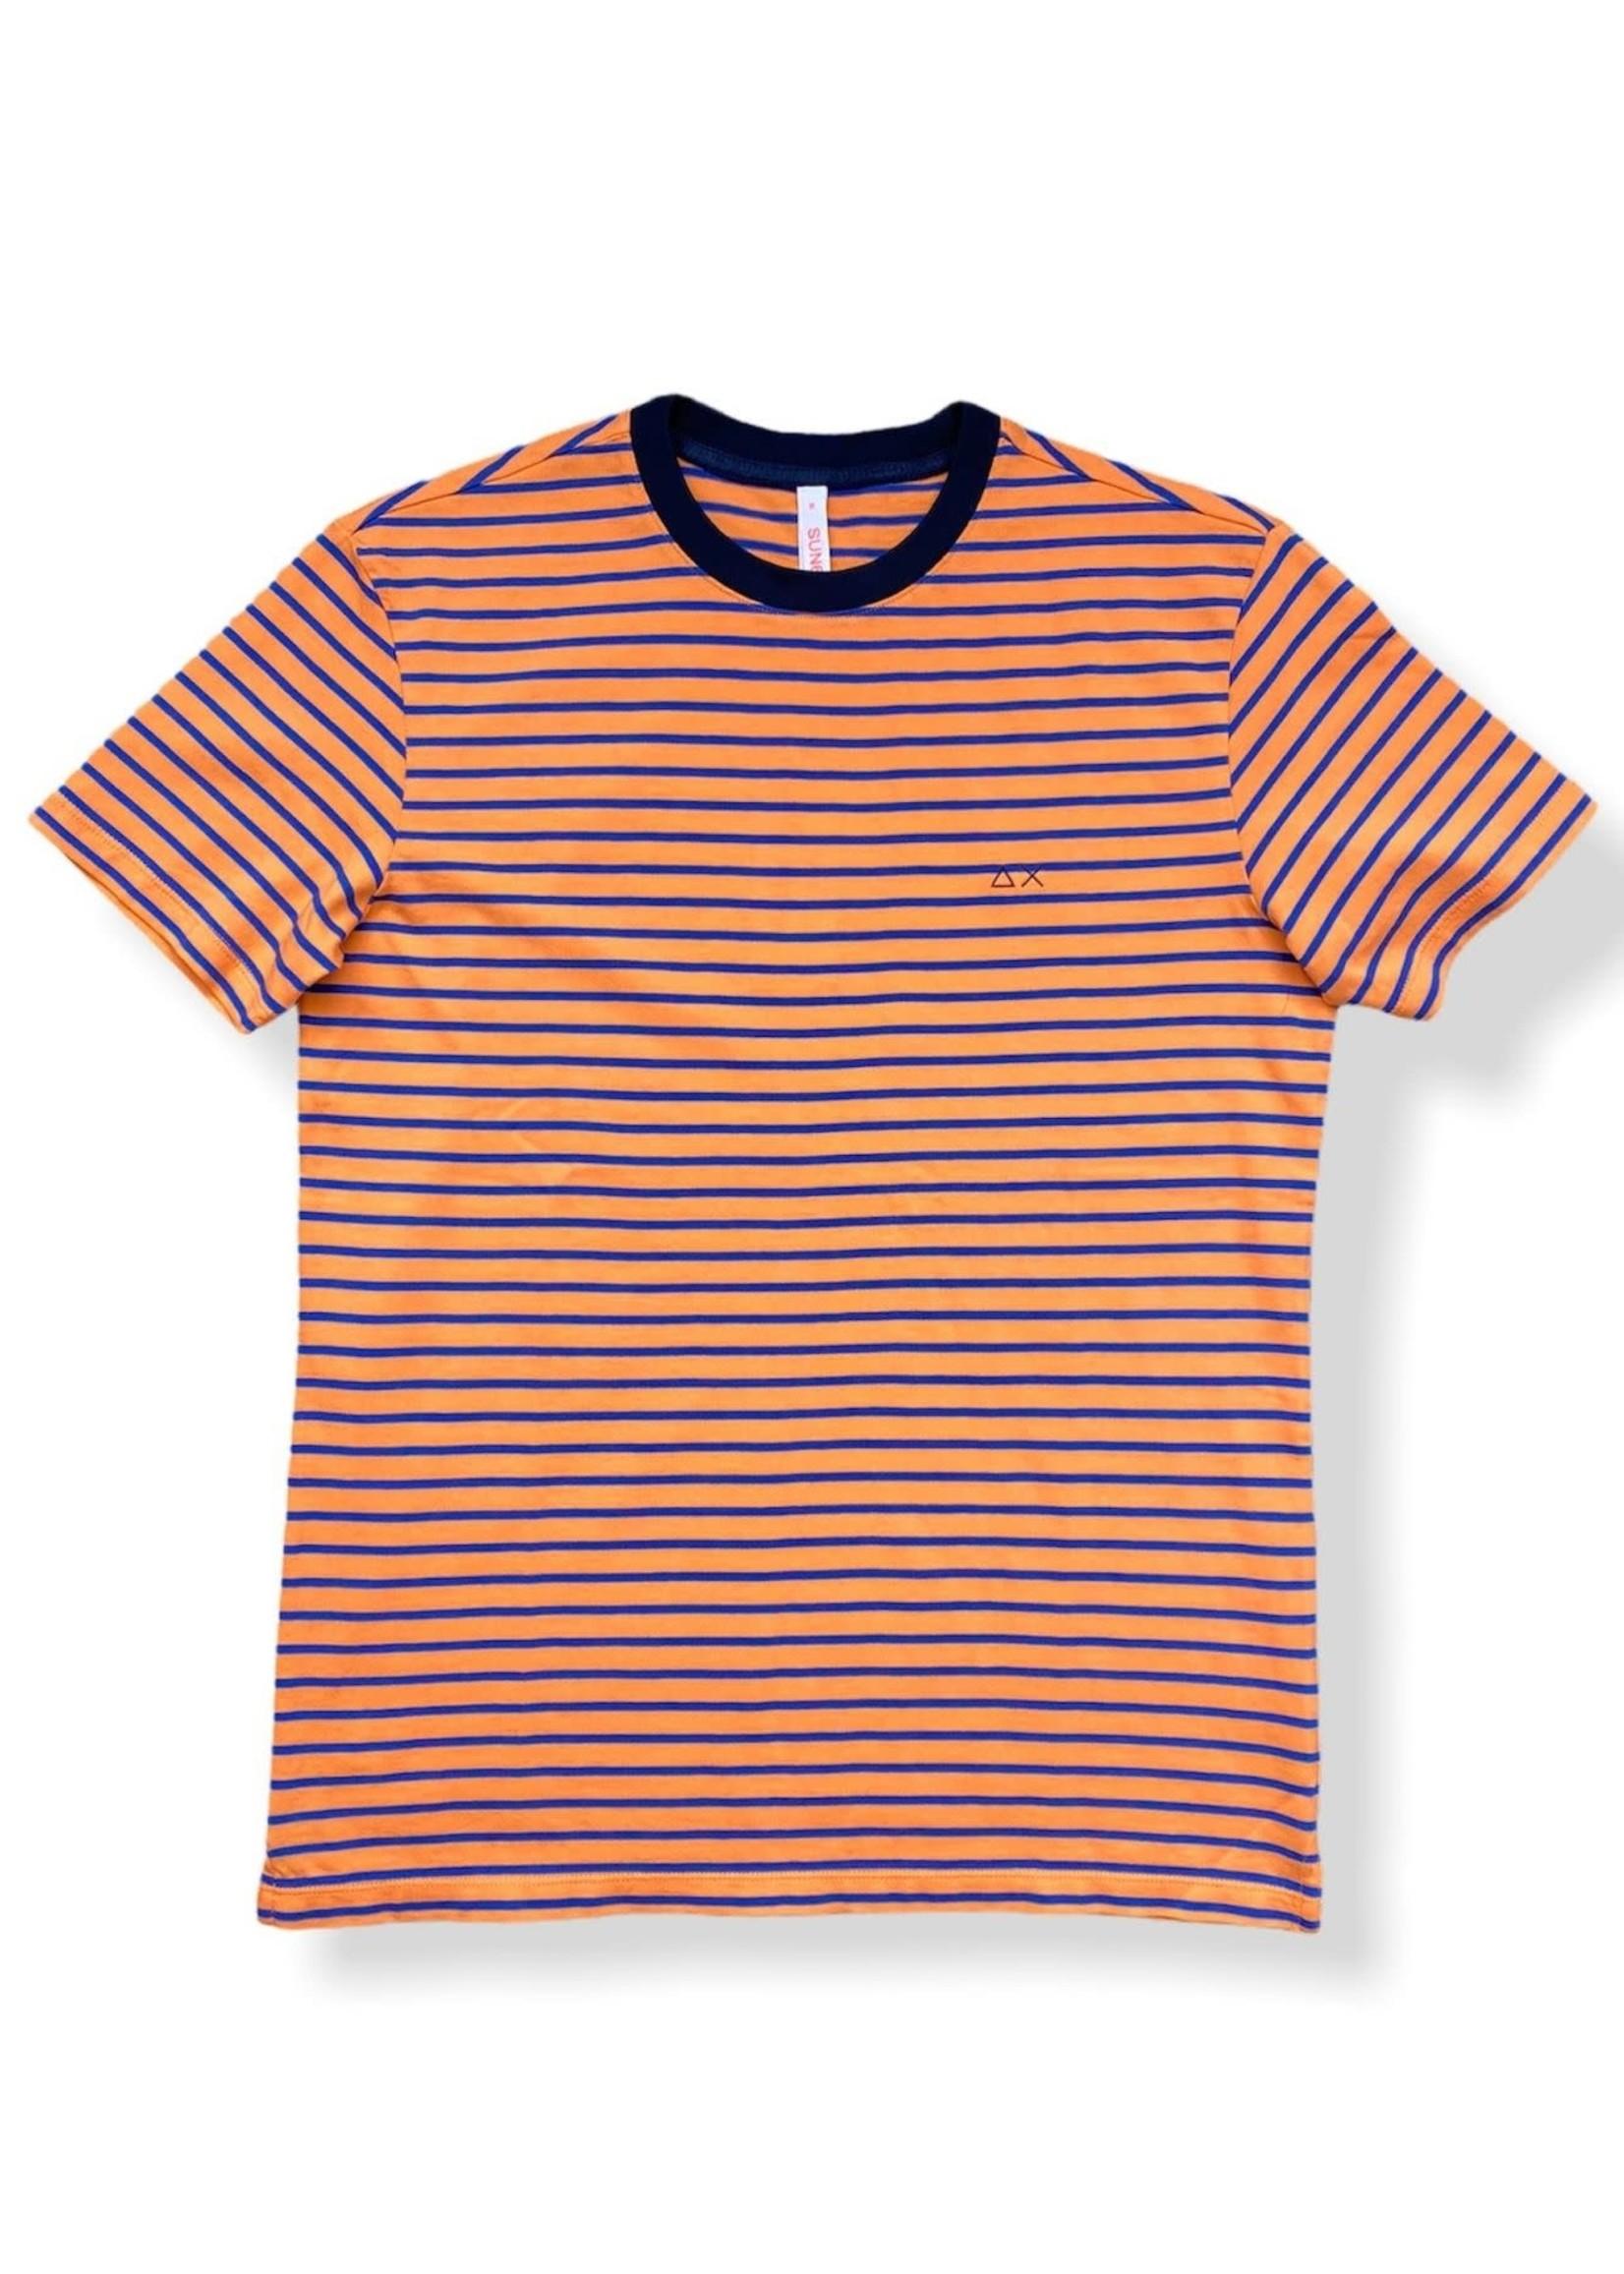 SUN68 T-Shirt Round Full Stripes   Oranje/Blauw   SUN68